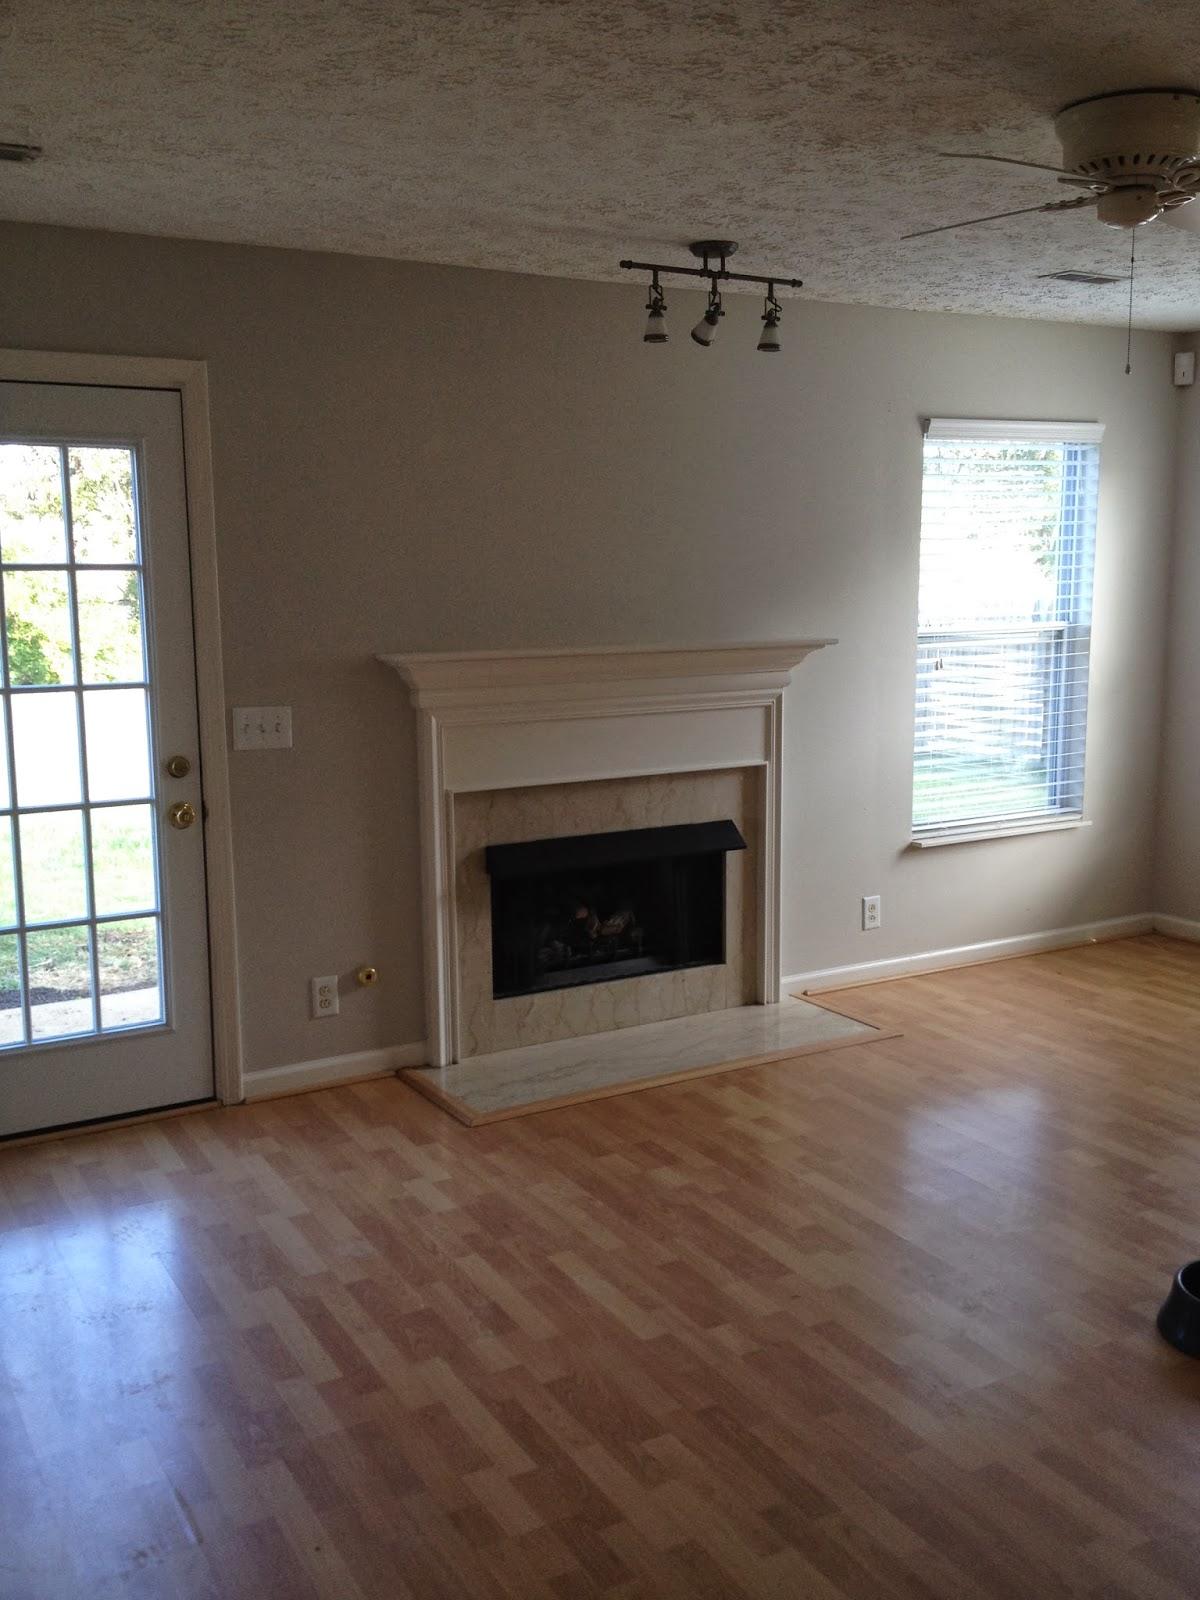 benjamin moore paints home depot home painting ideas. Black Bedroom Furniture Sets. Home Design Ideas